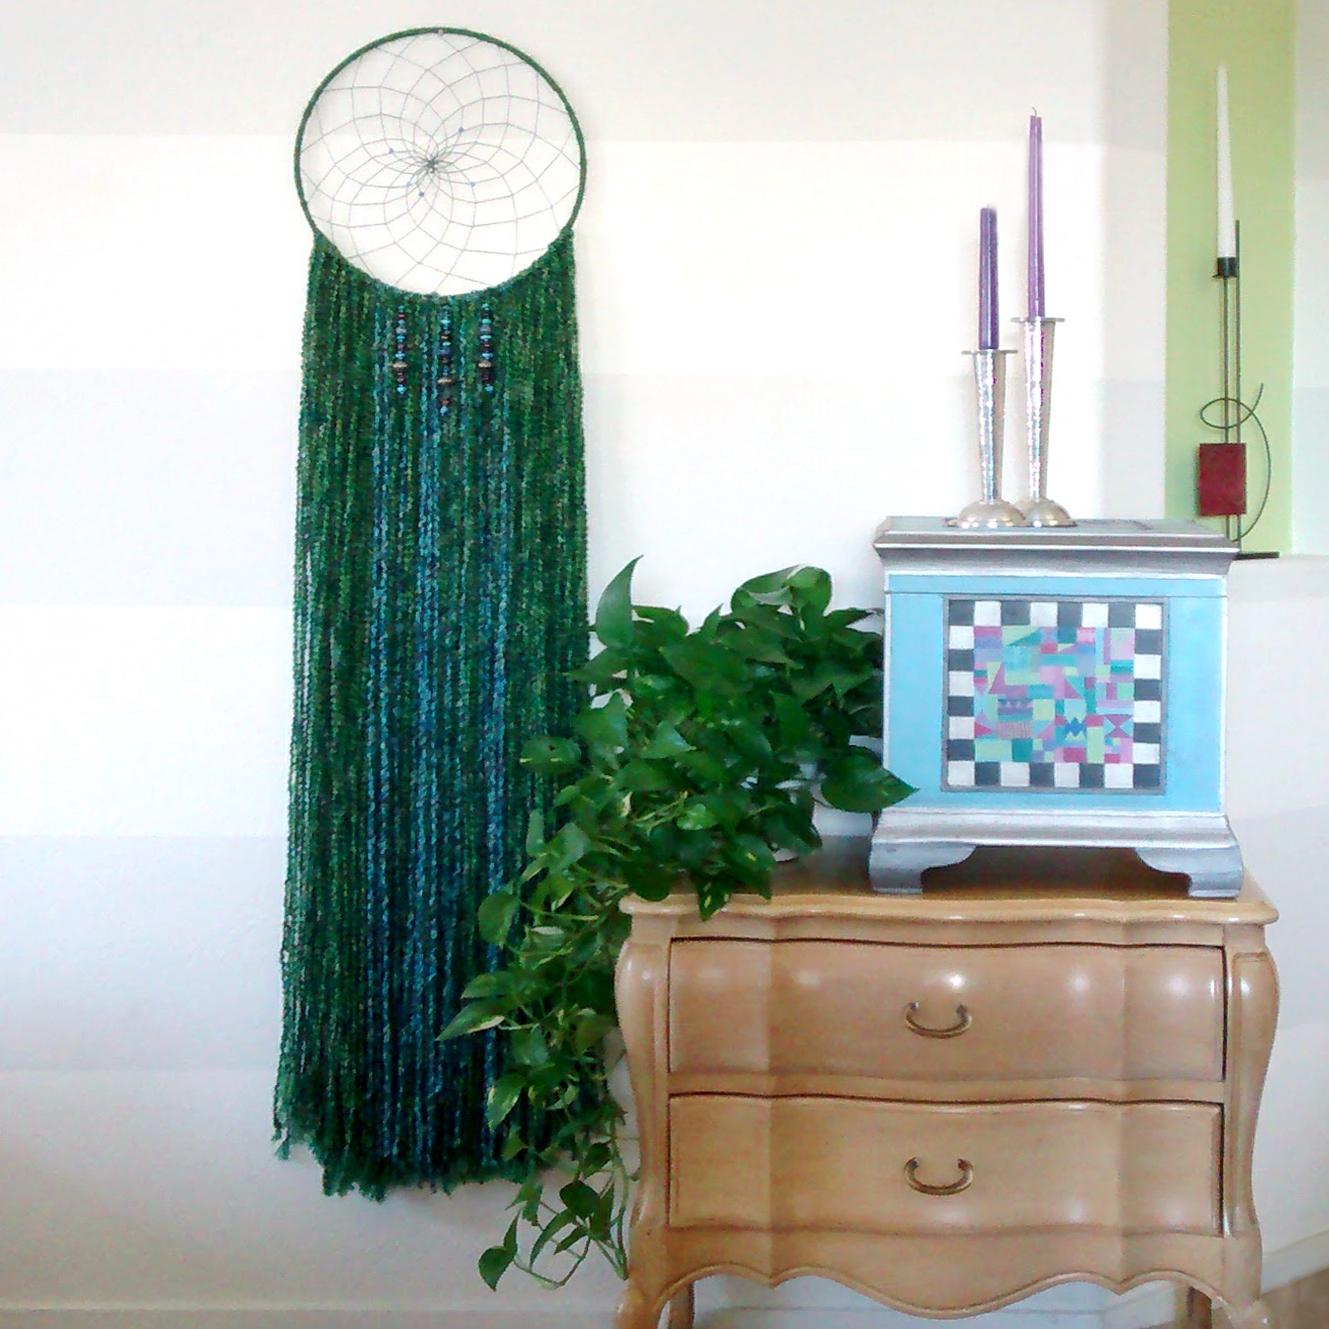 Rainforest Falls Dreamcatcher with painted box & plants & candles.jpg